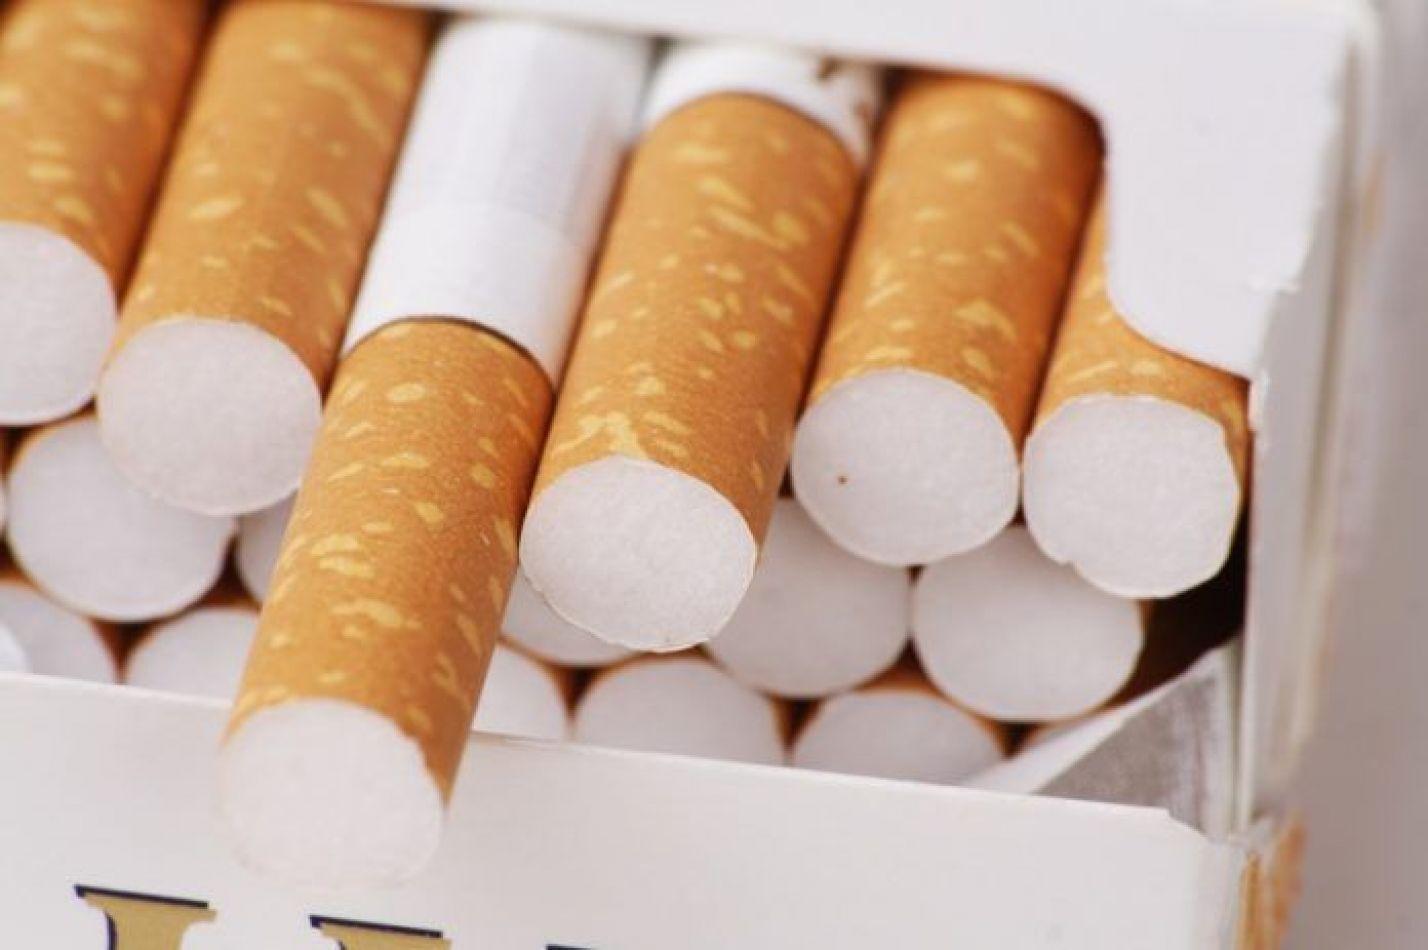 Massalin aumentó sus cigarrillos un 5%